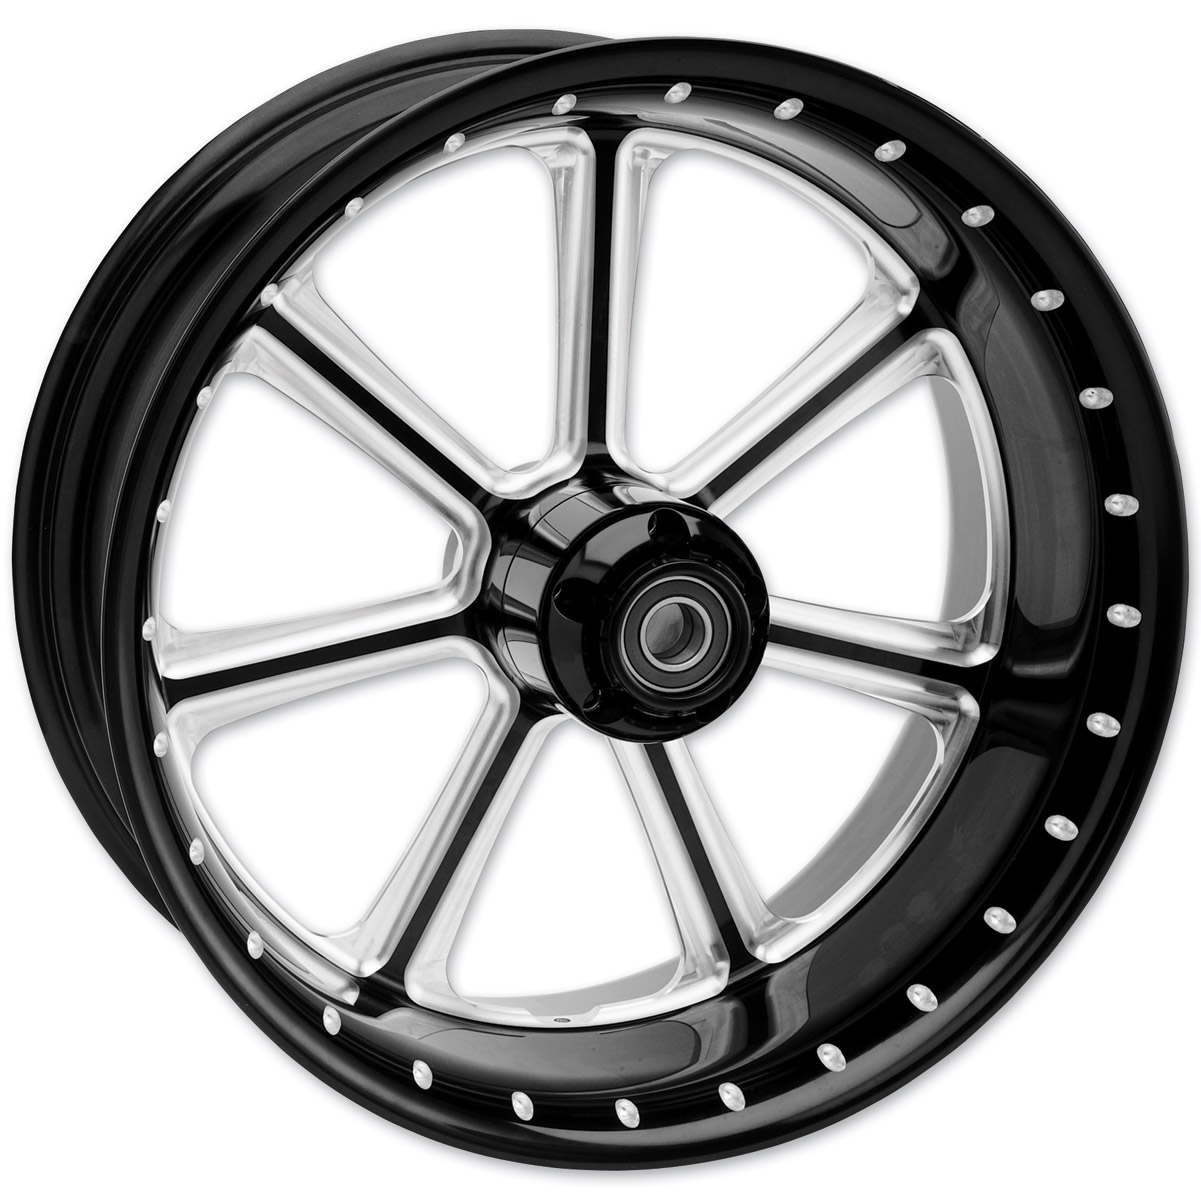 Roland Sands Design Contrast Cut Diesel Front Wheel, 21″ x 3.5″